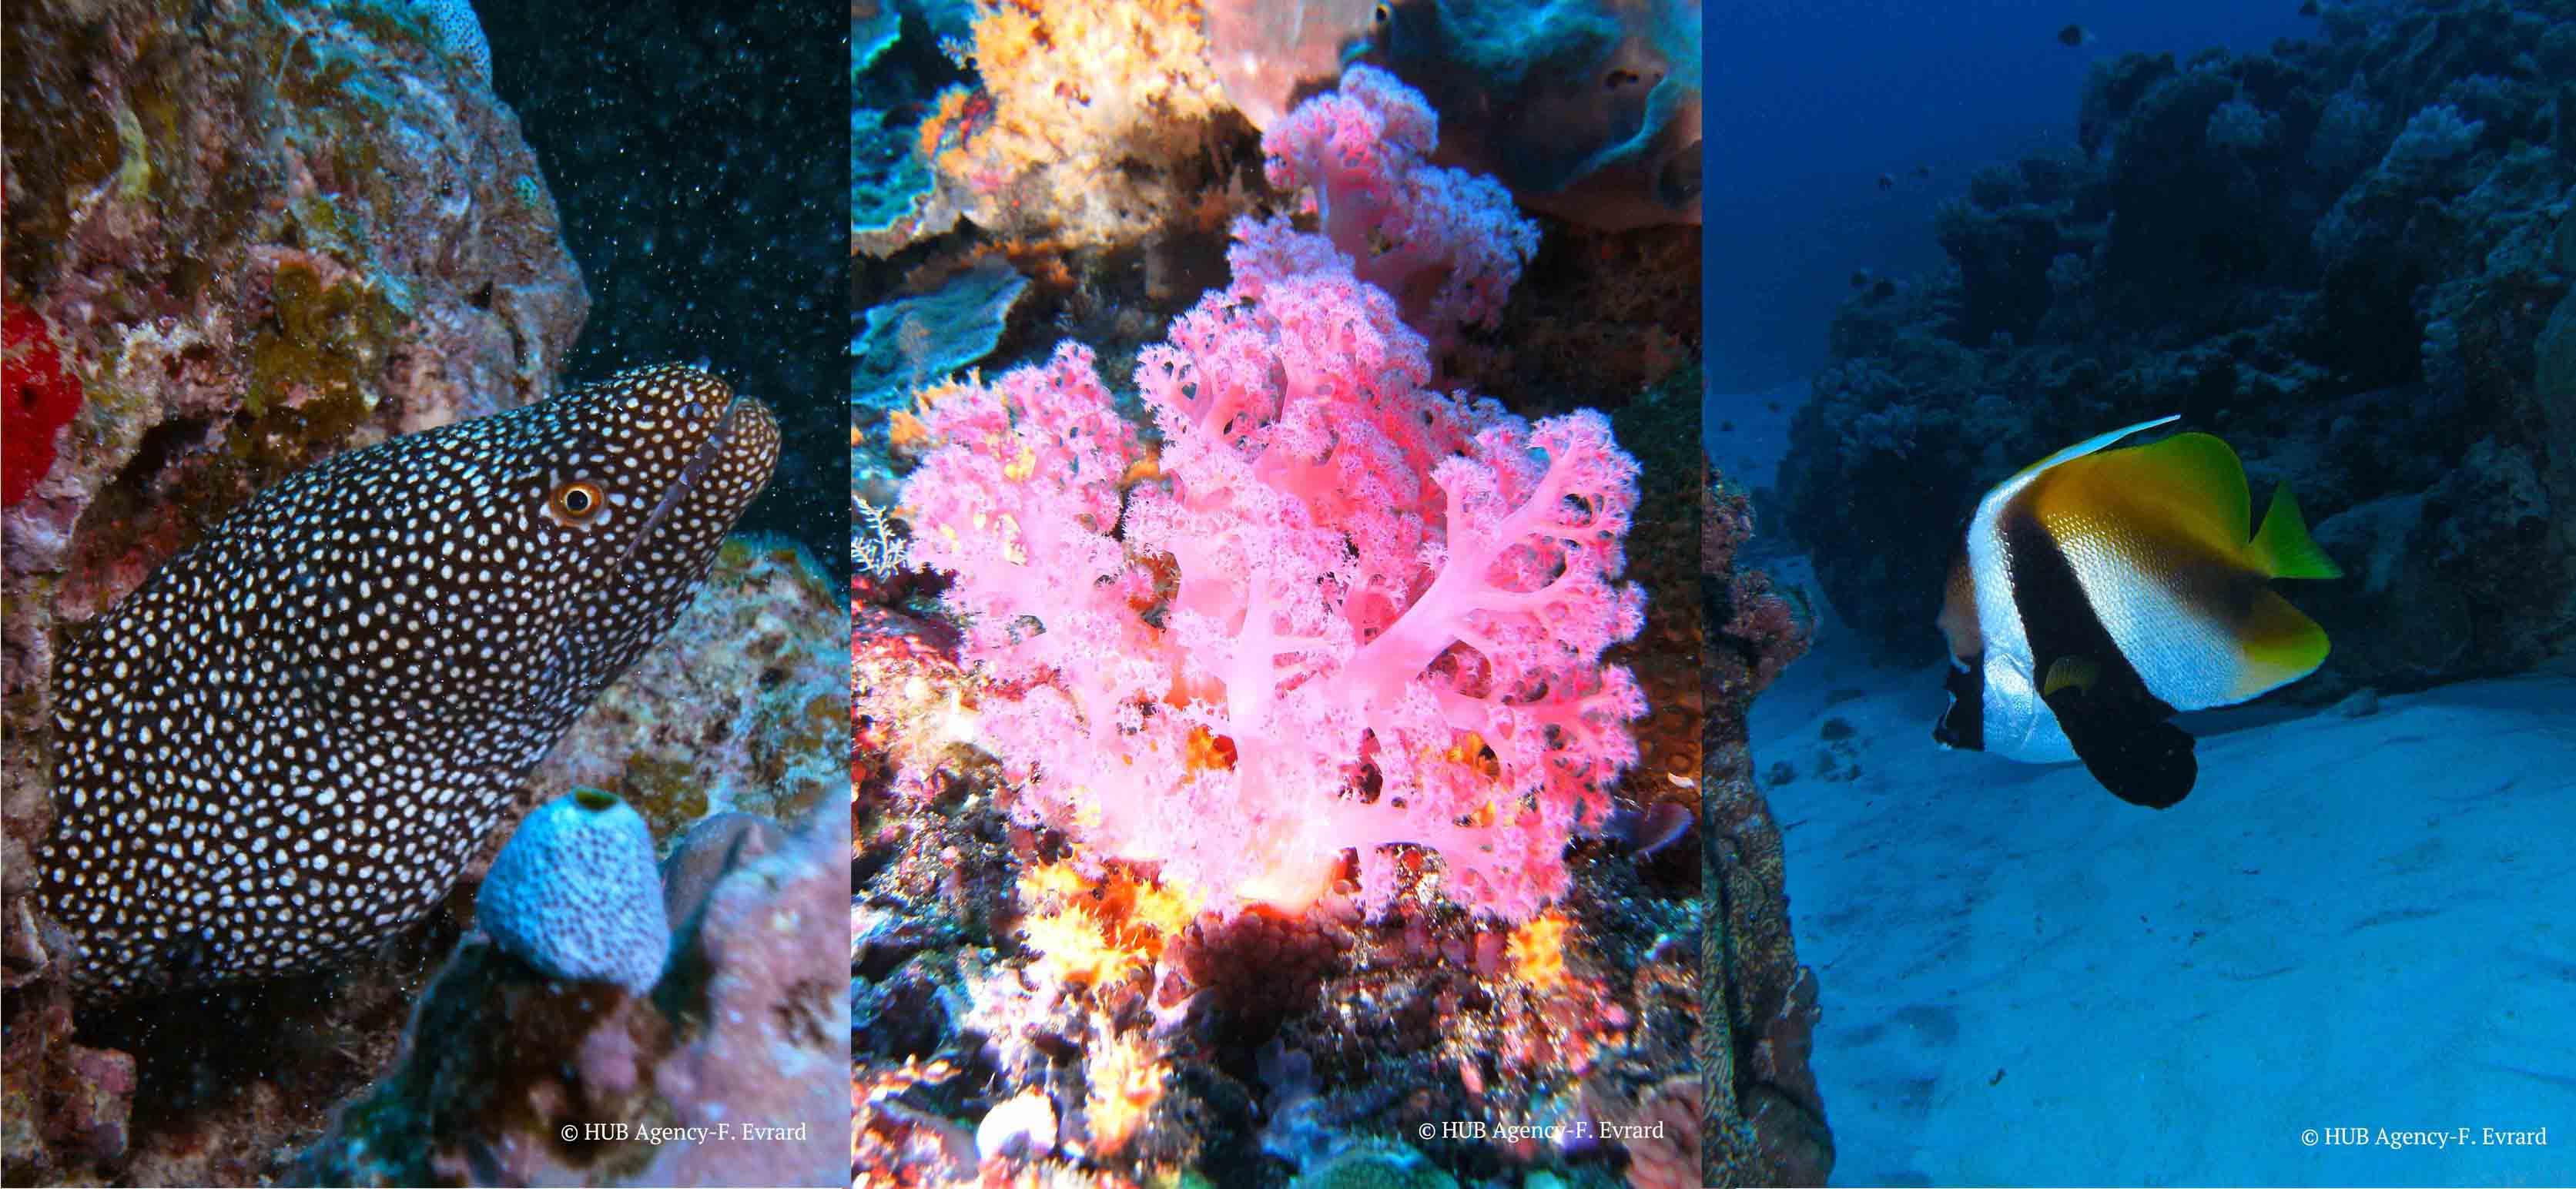 Plongée Diving Padi Scuba Poisson Murène poisson scorpion lionfish corail Iles Maldives Bali Maurice Madagascar Mexique Caraïbe Tahiti